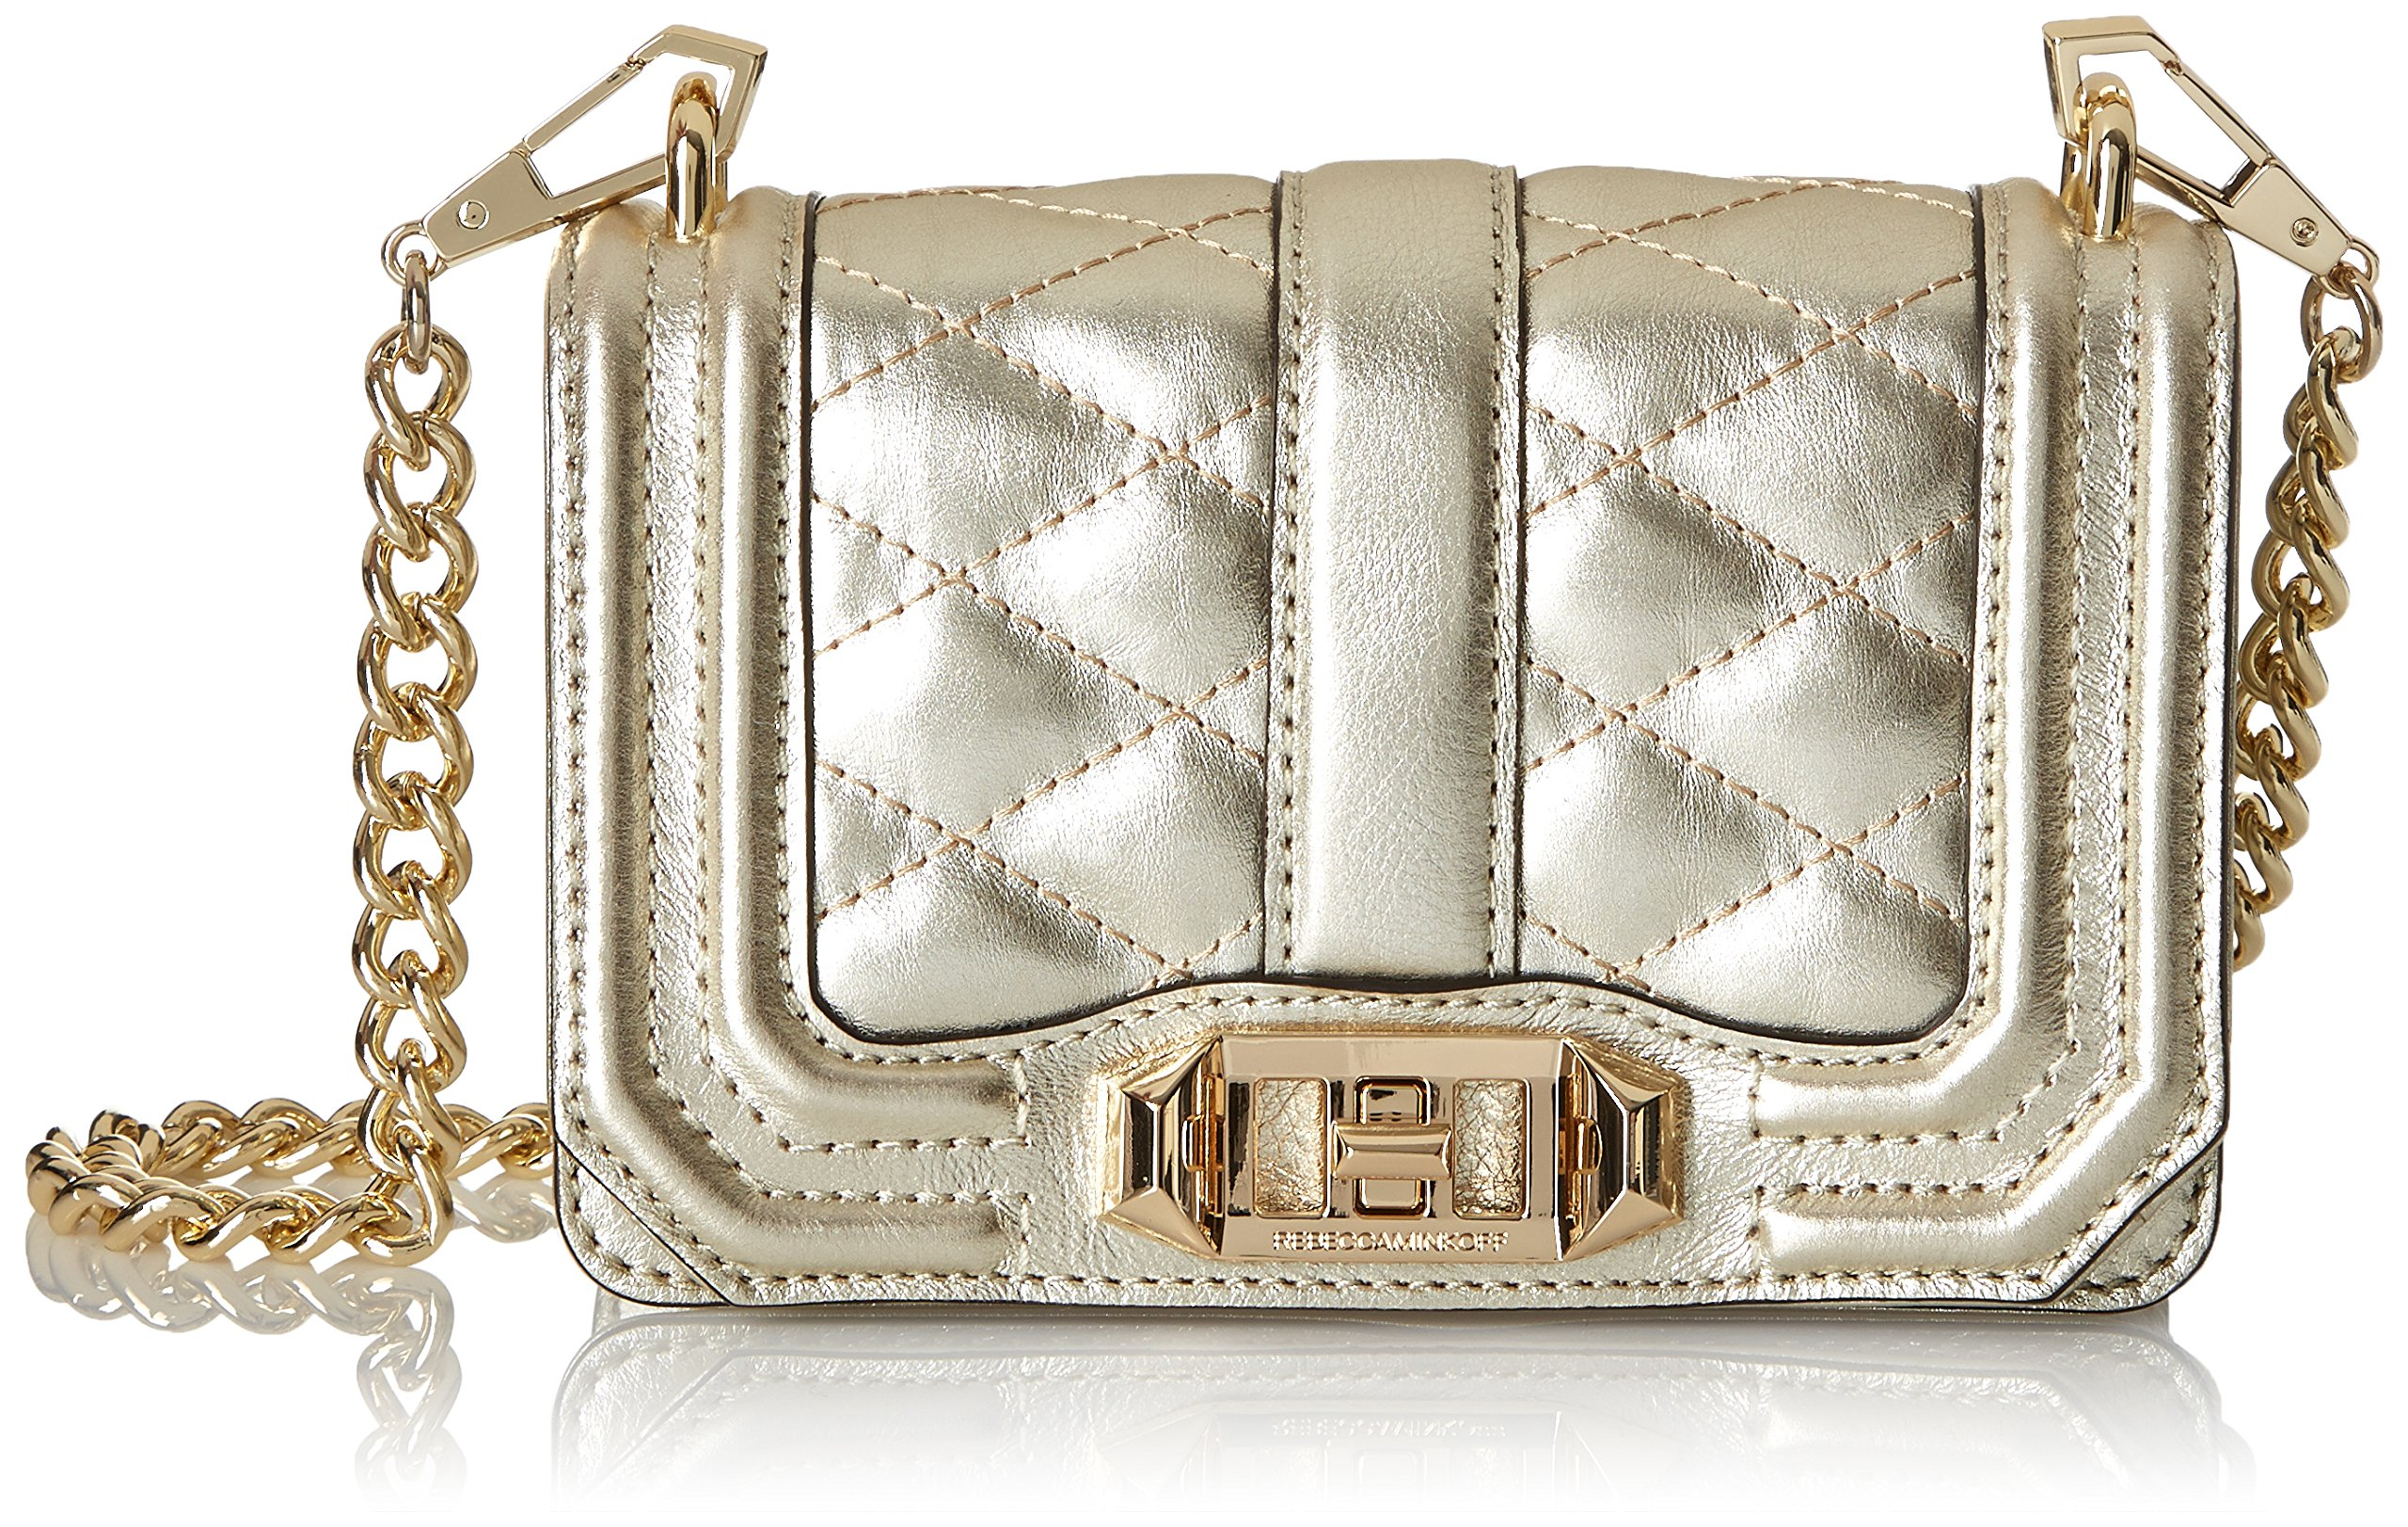 Rebecca Minkoff Mini Love Cross Body Bag, Pewter, One Size